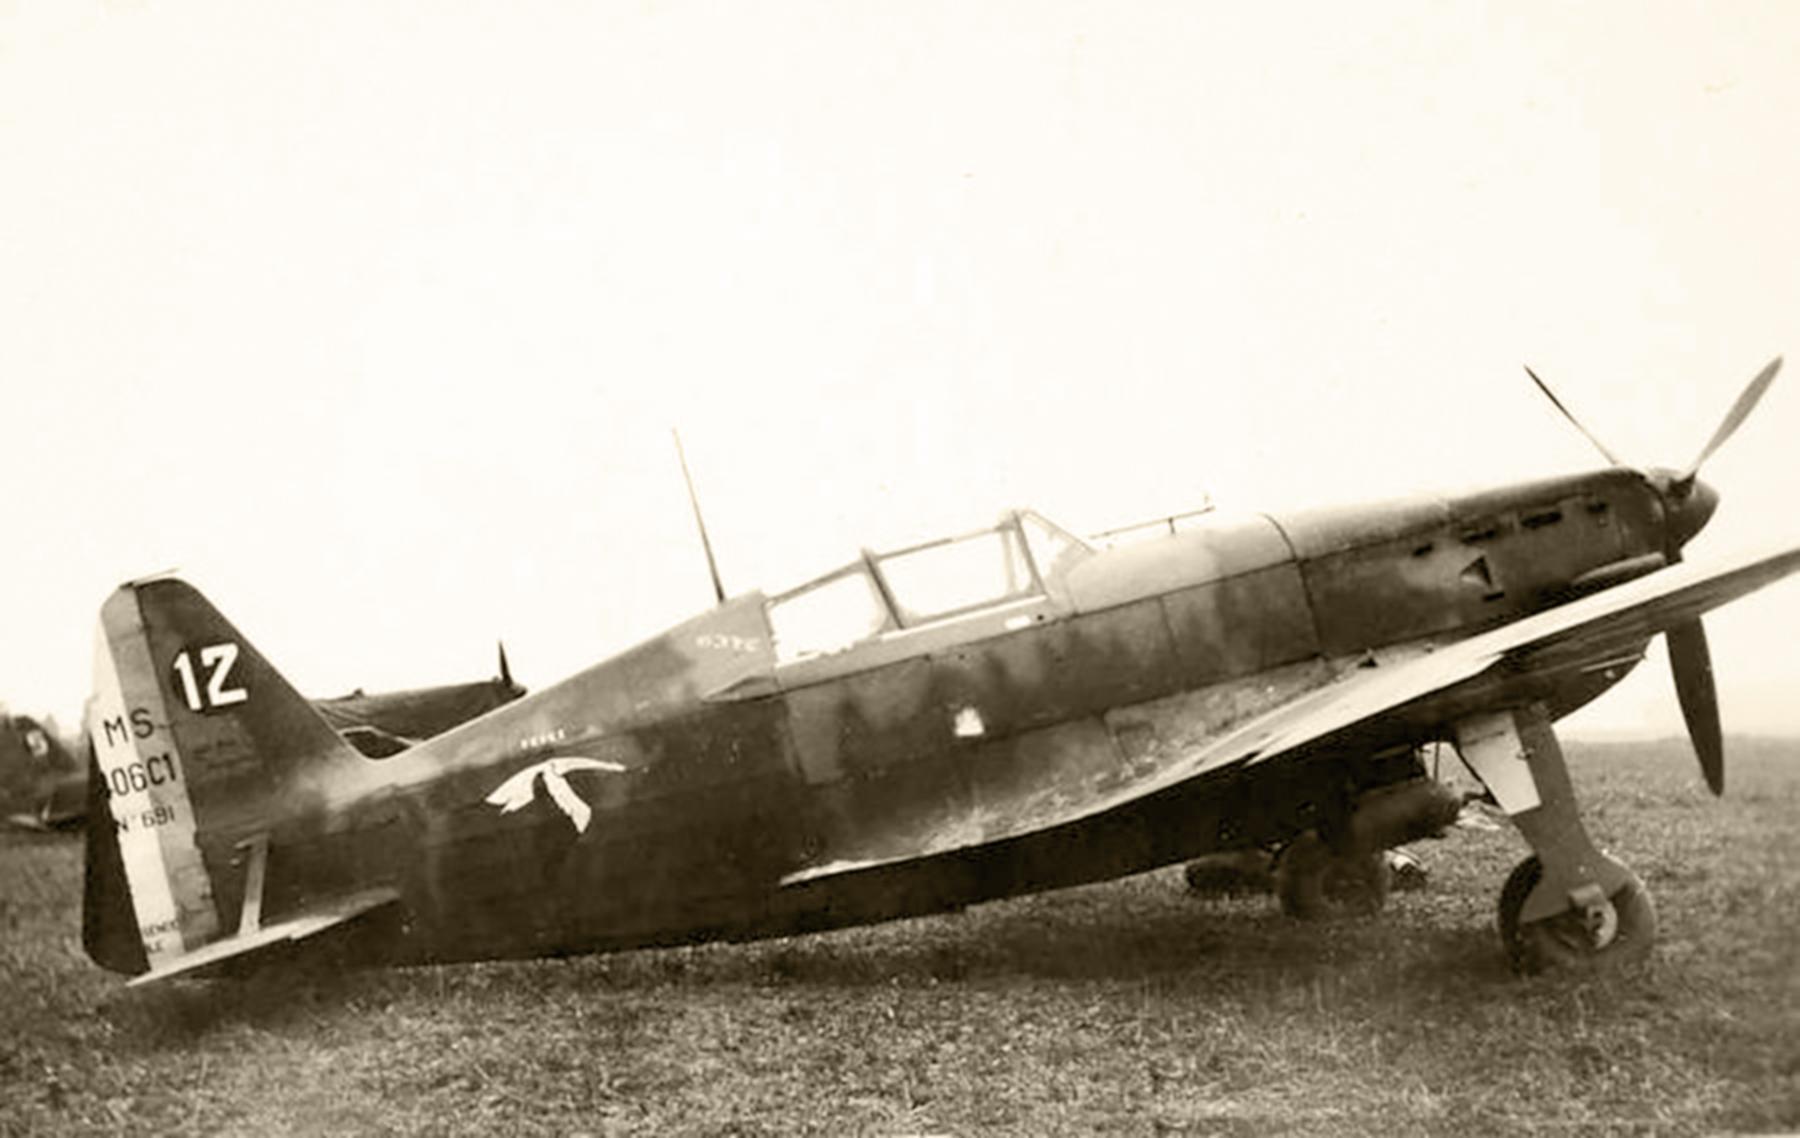 French Airforce Morane Saulnier MS 406C1 sn691 GC I.2 White 12 France 1940 web 01